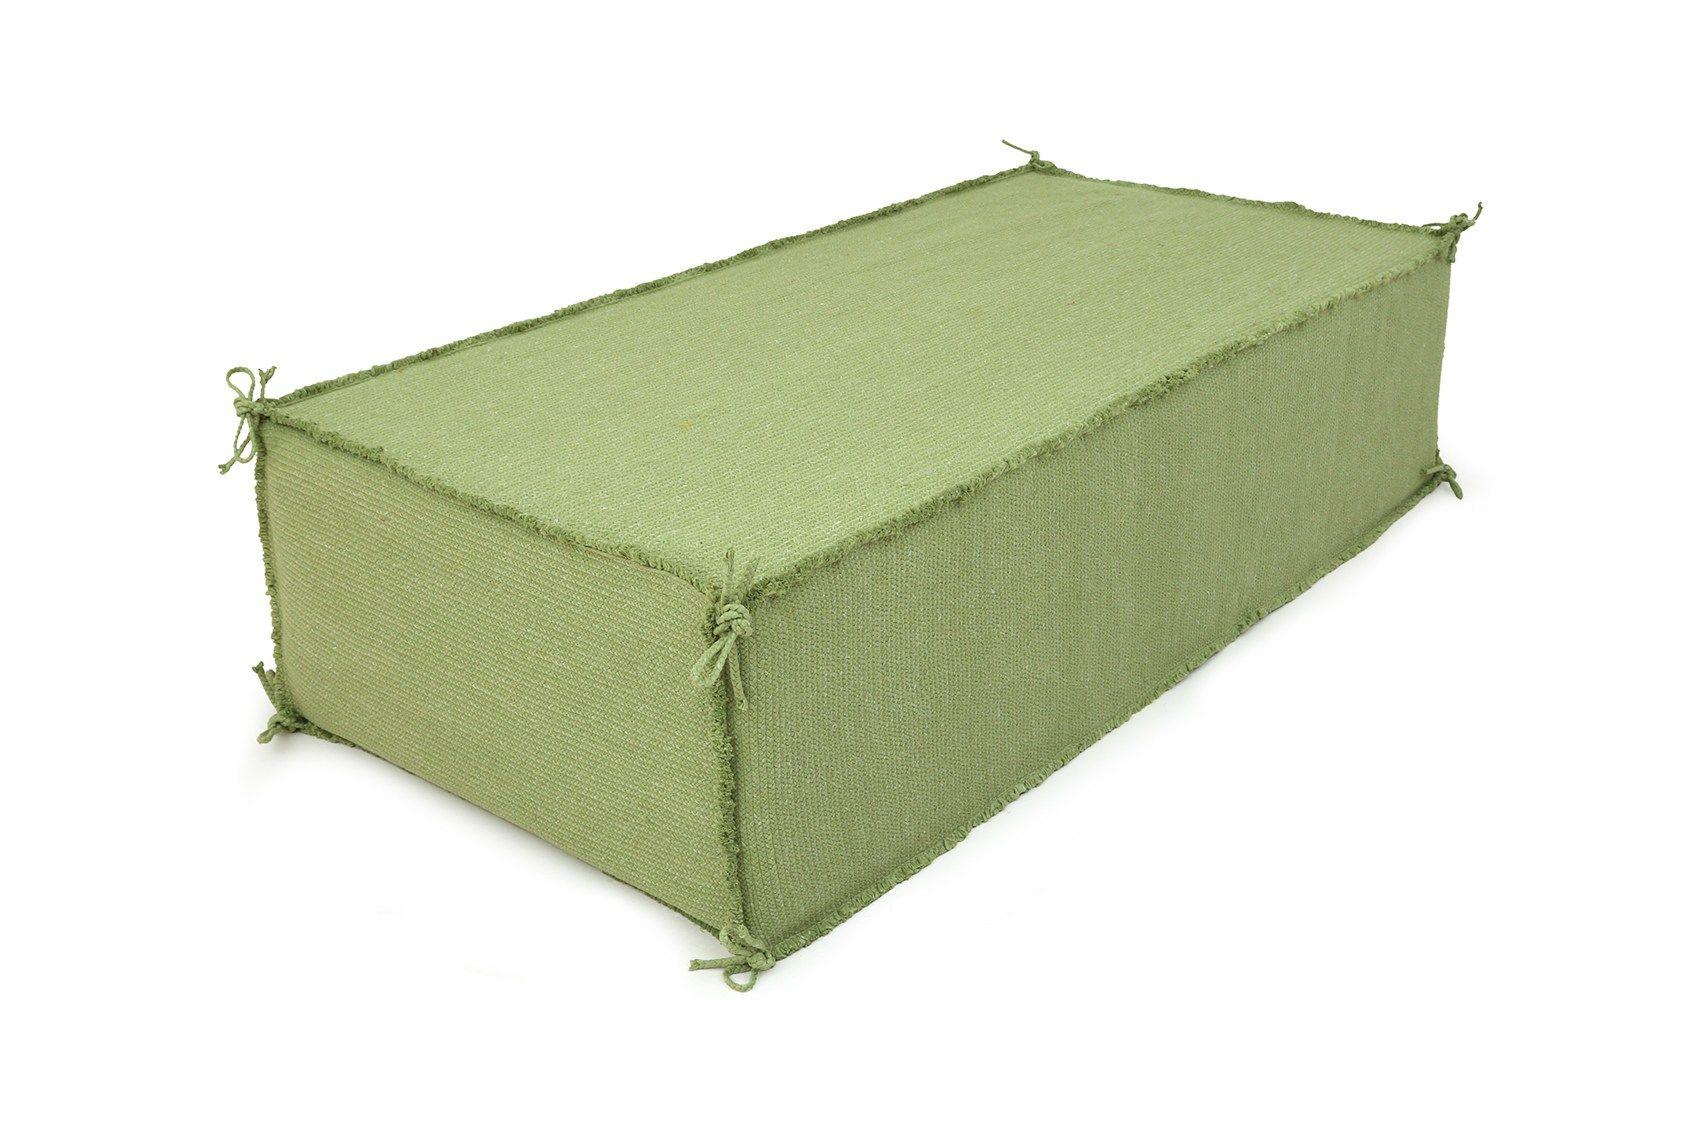 ISLAND Modular sofa by Darono